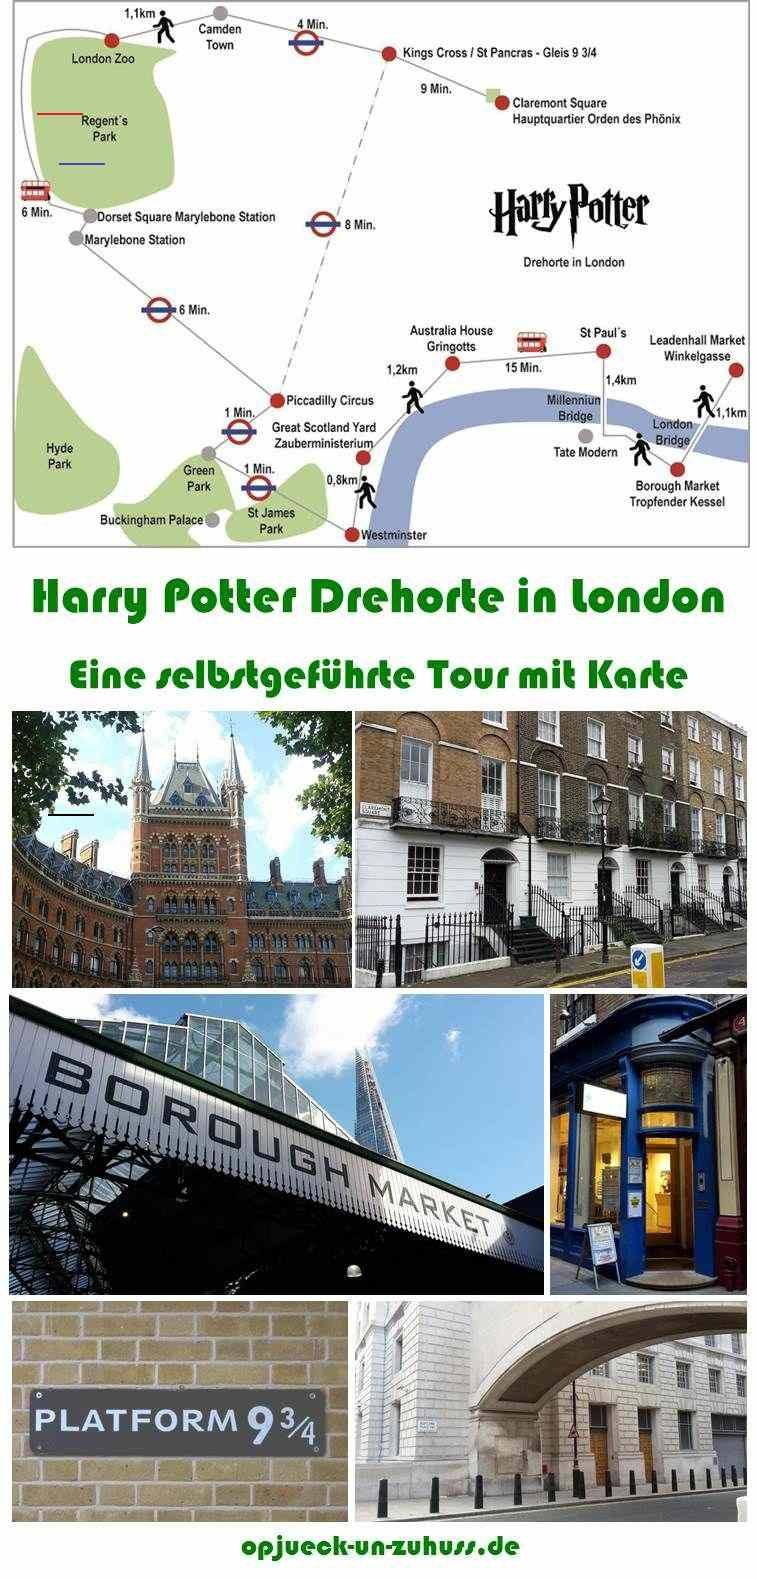 Travelengland 10 Harry Potter Drehorte In London Auf Eigene Faust Erkunden Selbstgefuhrte Walking Tour Inklusive Karte Leadenhall Londen Harry Potter Reis